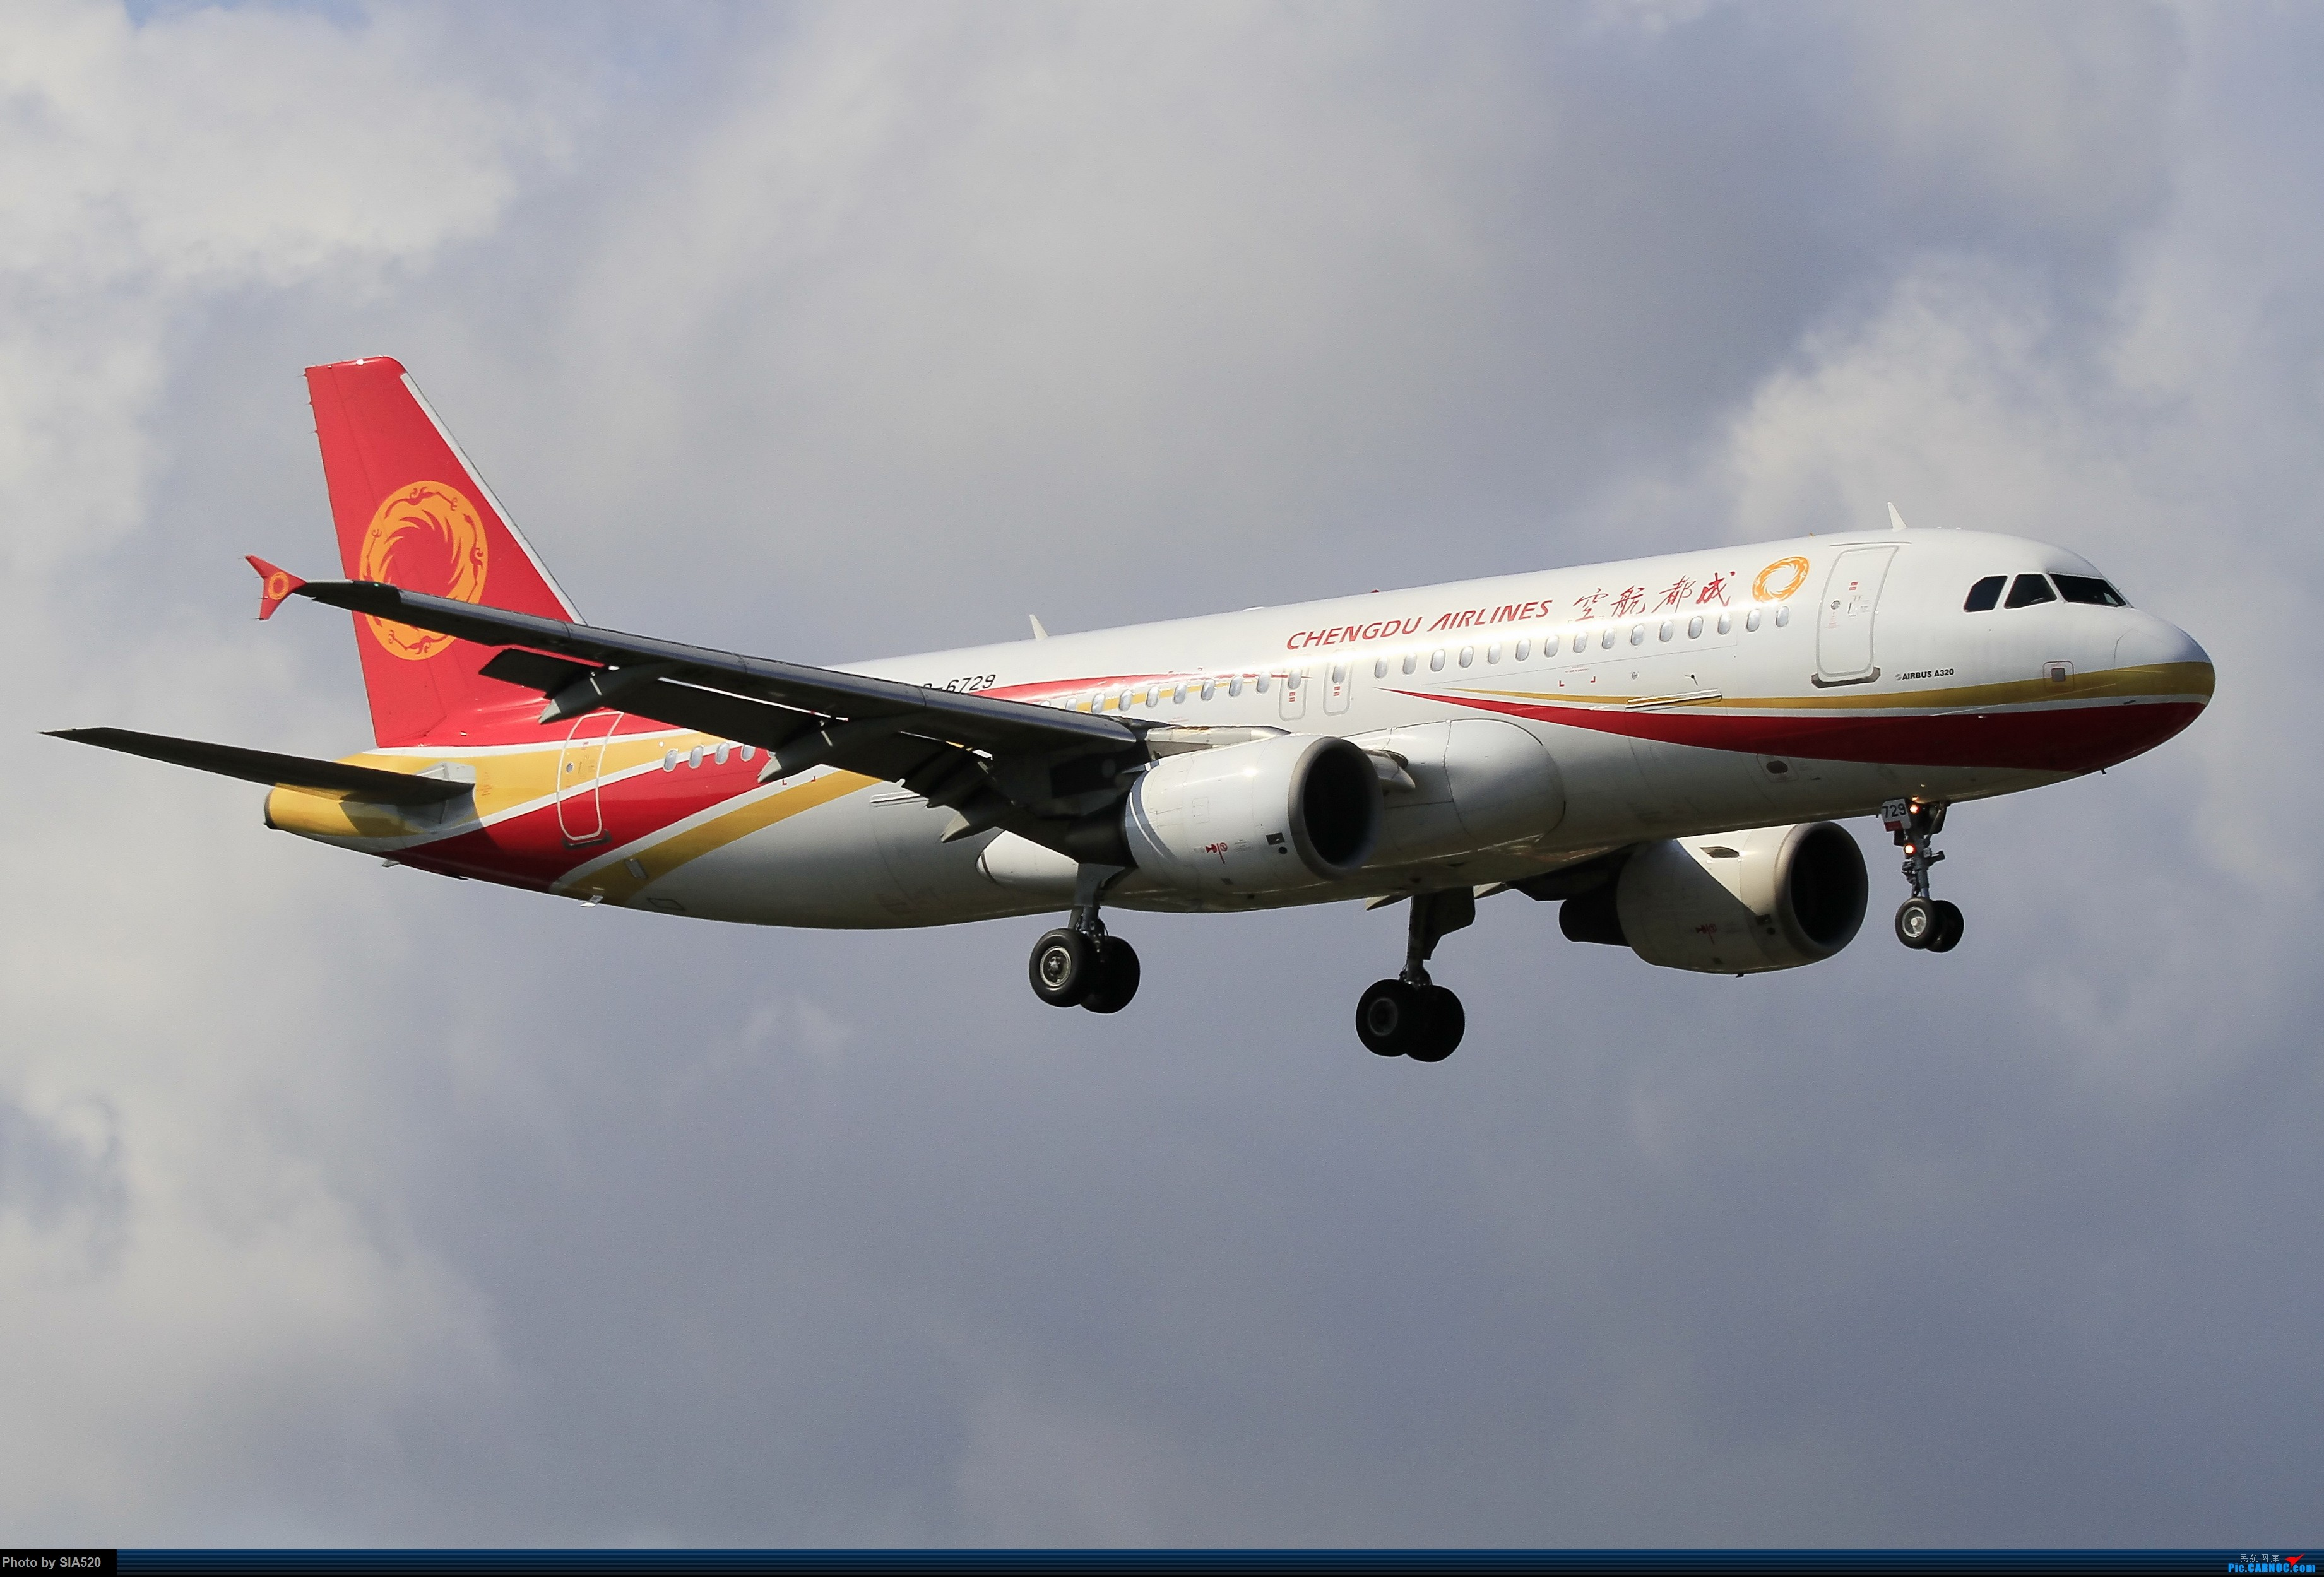 Re:[原创]北京人儿在三亚—600mm解锁凤凰 AIRBUS A320-200 B-6729 中国三亚凤凰国际机场